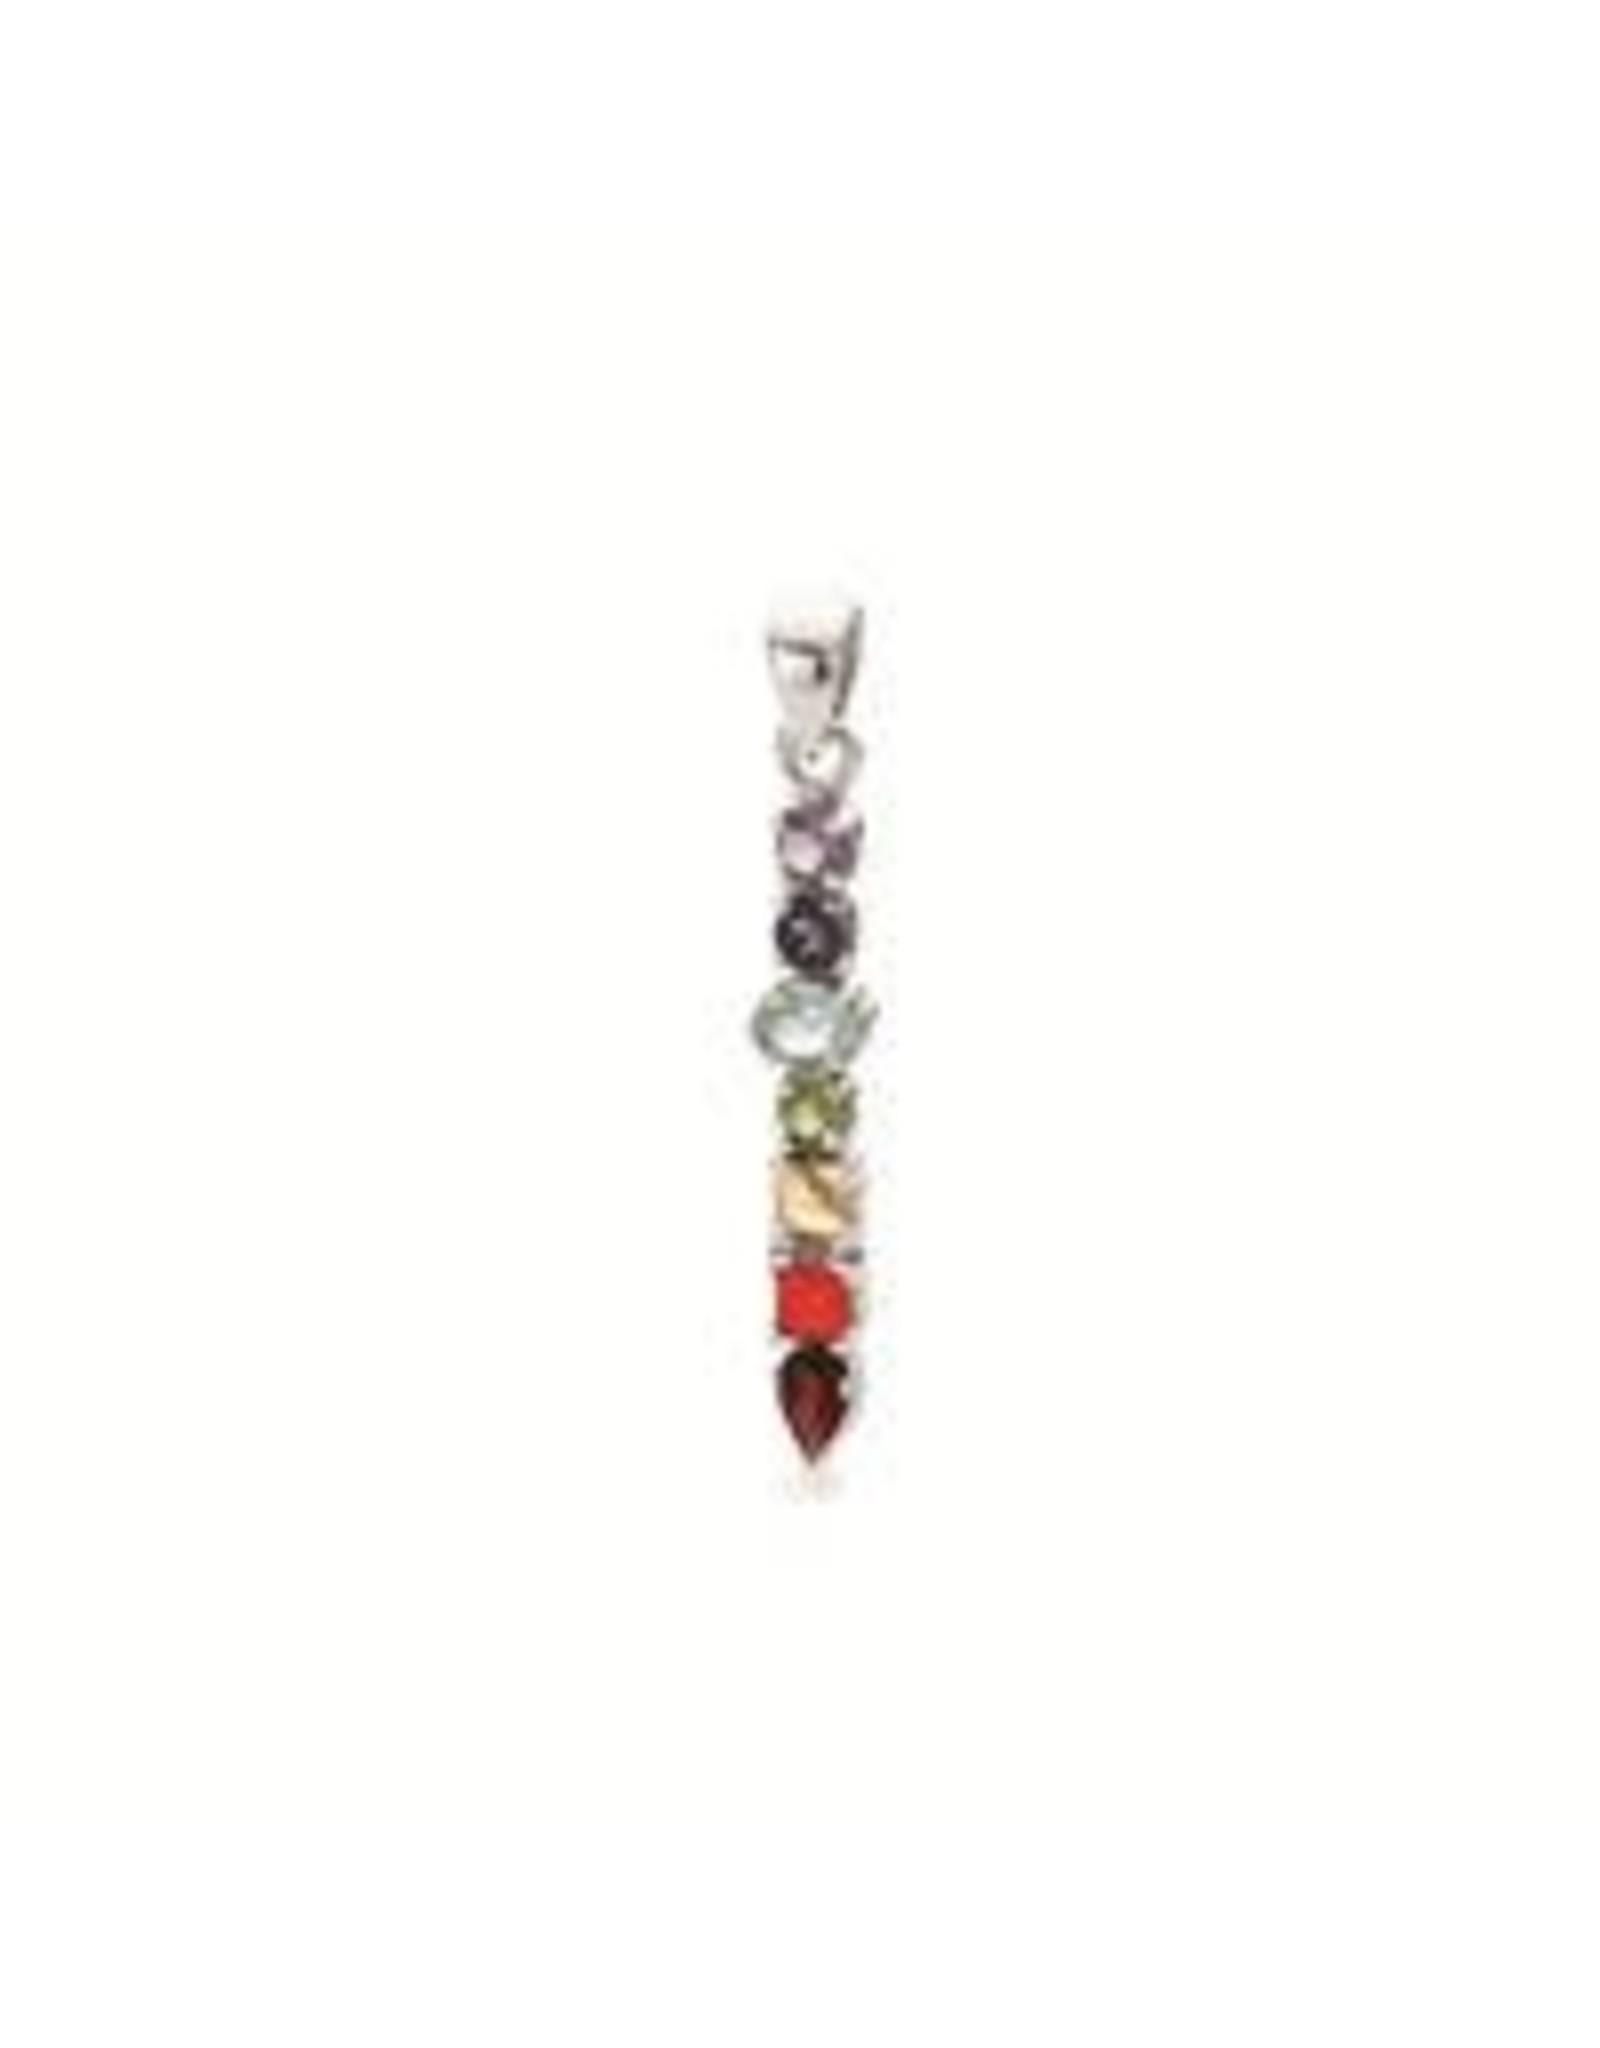 Stones & Silver Chakra Pendant 4.3cm (S/S)